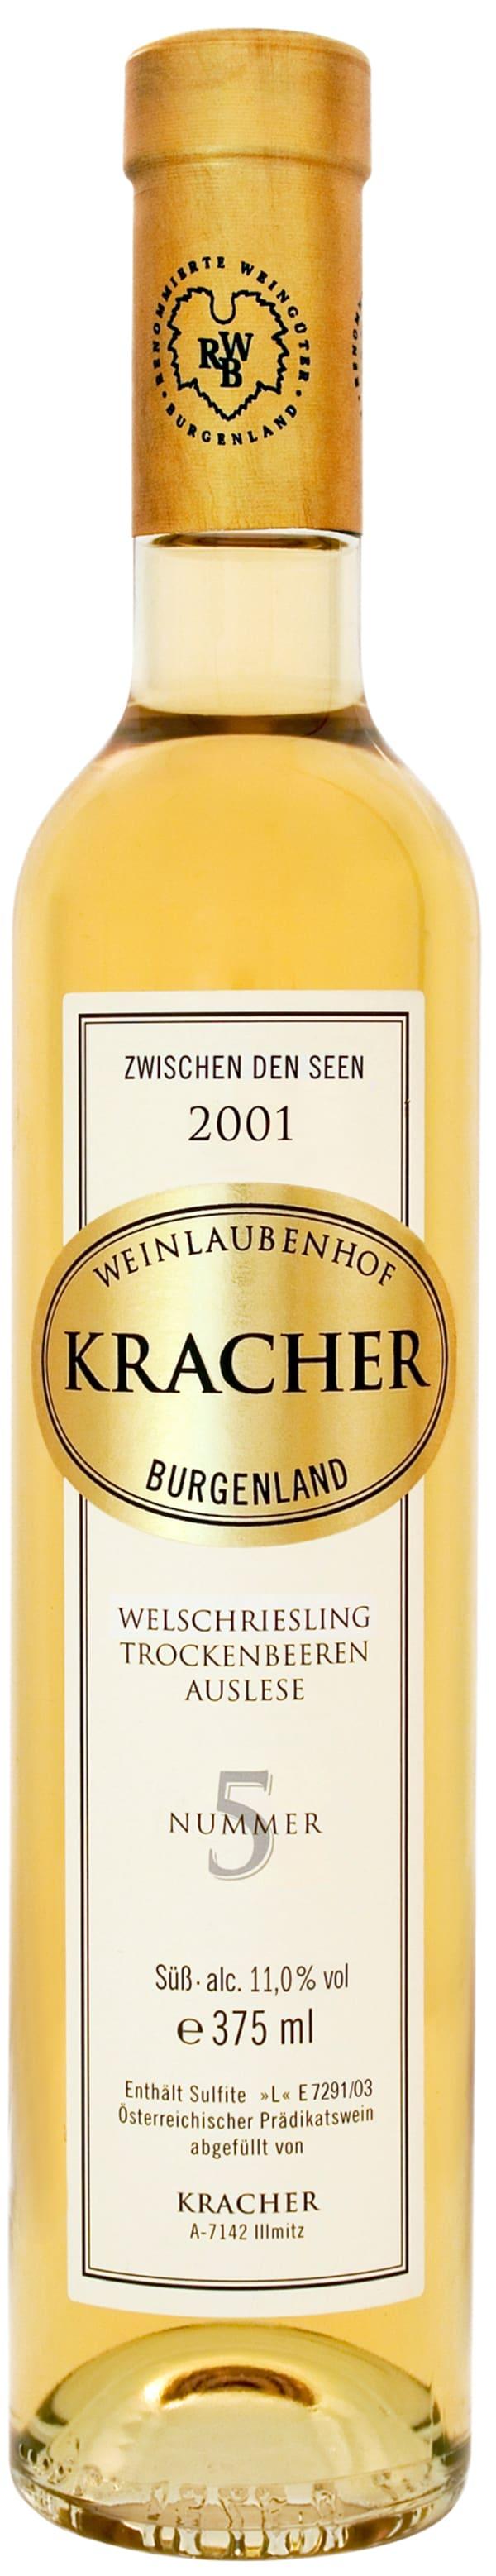 Kracher Welschriesling Trockenbeerenauslese Nummer 5 2001